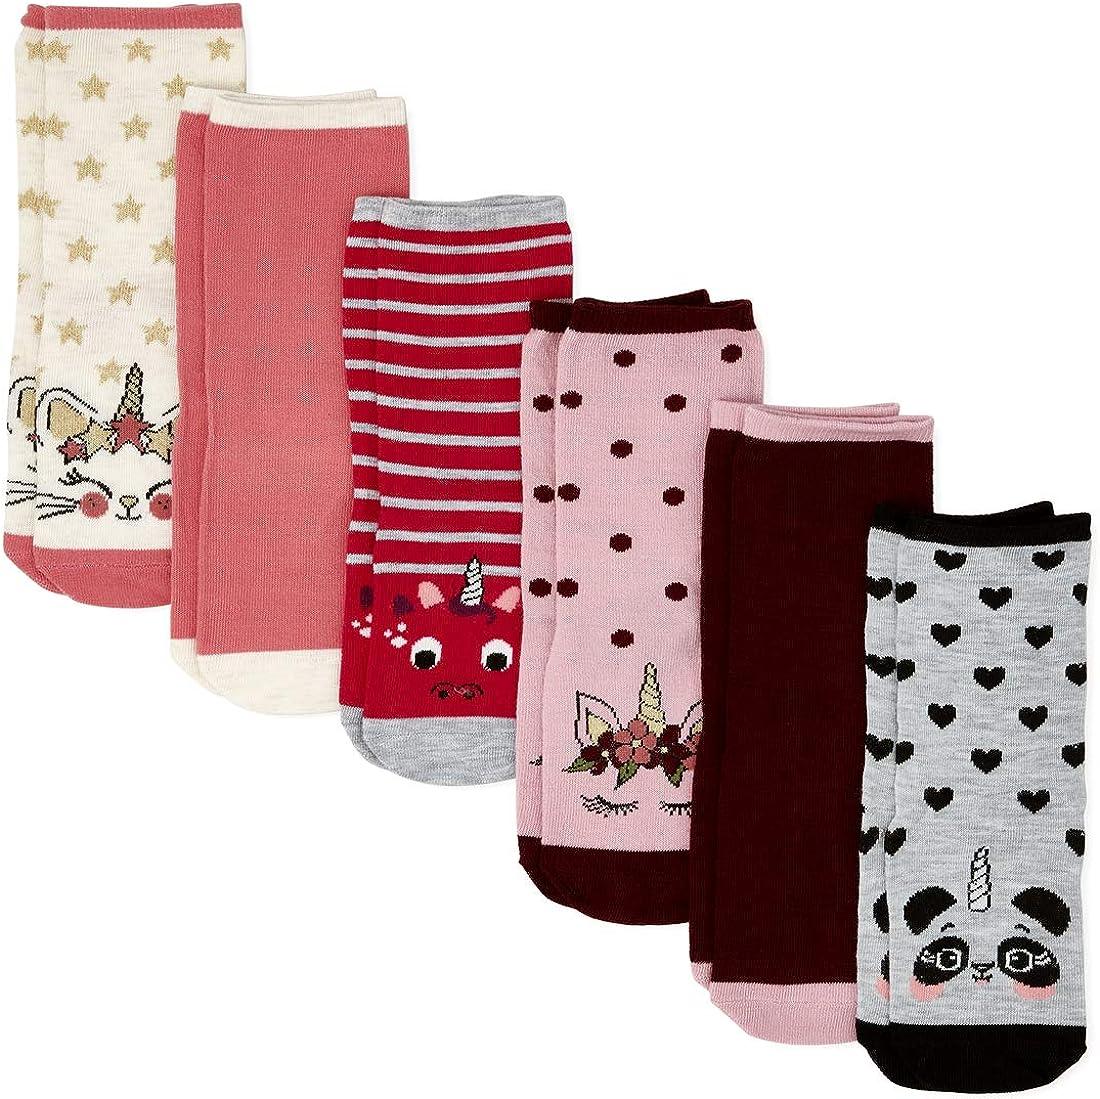 The Children's Place girls 6 Pack Crew Socks